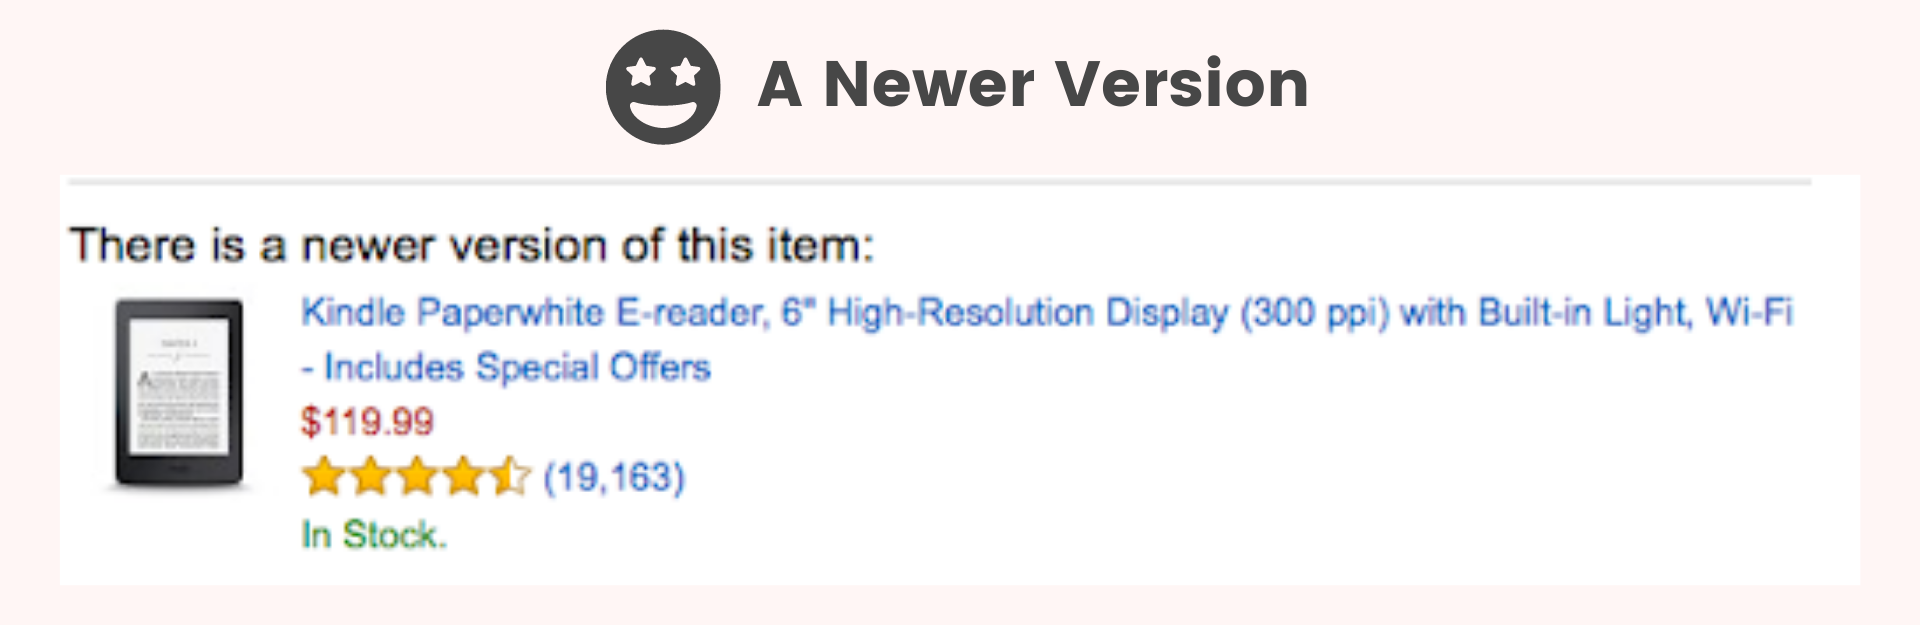 Amazon newer version